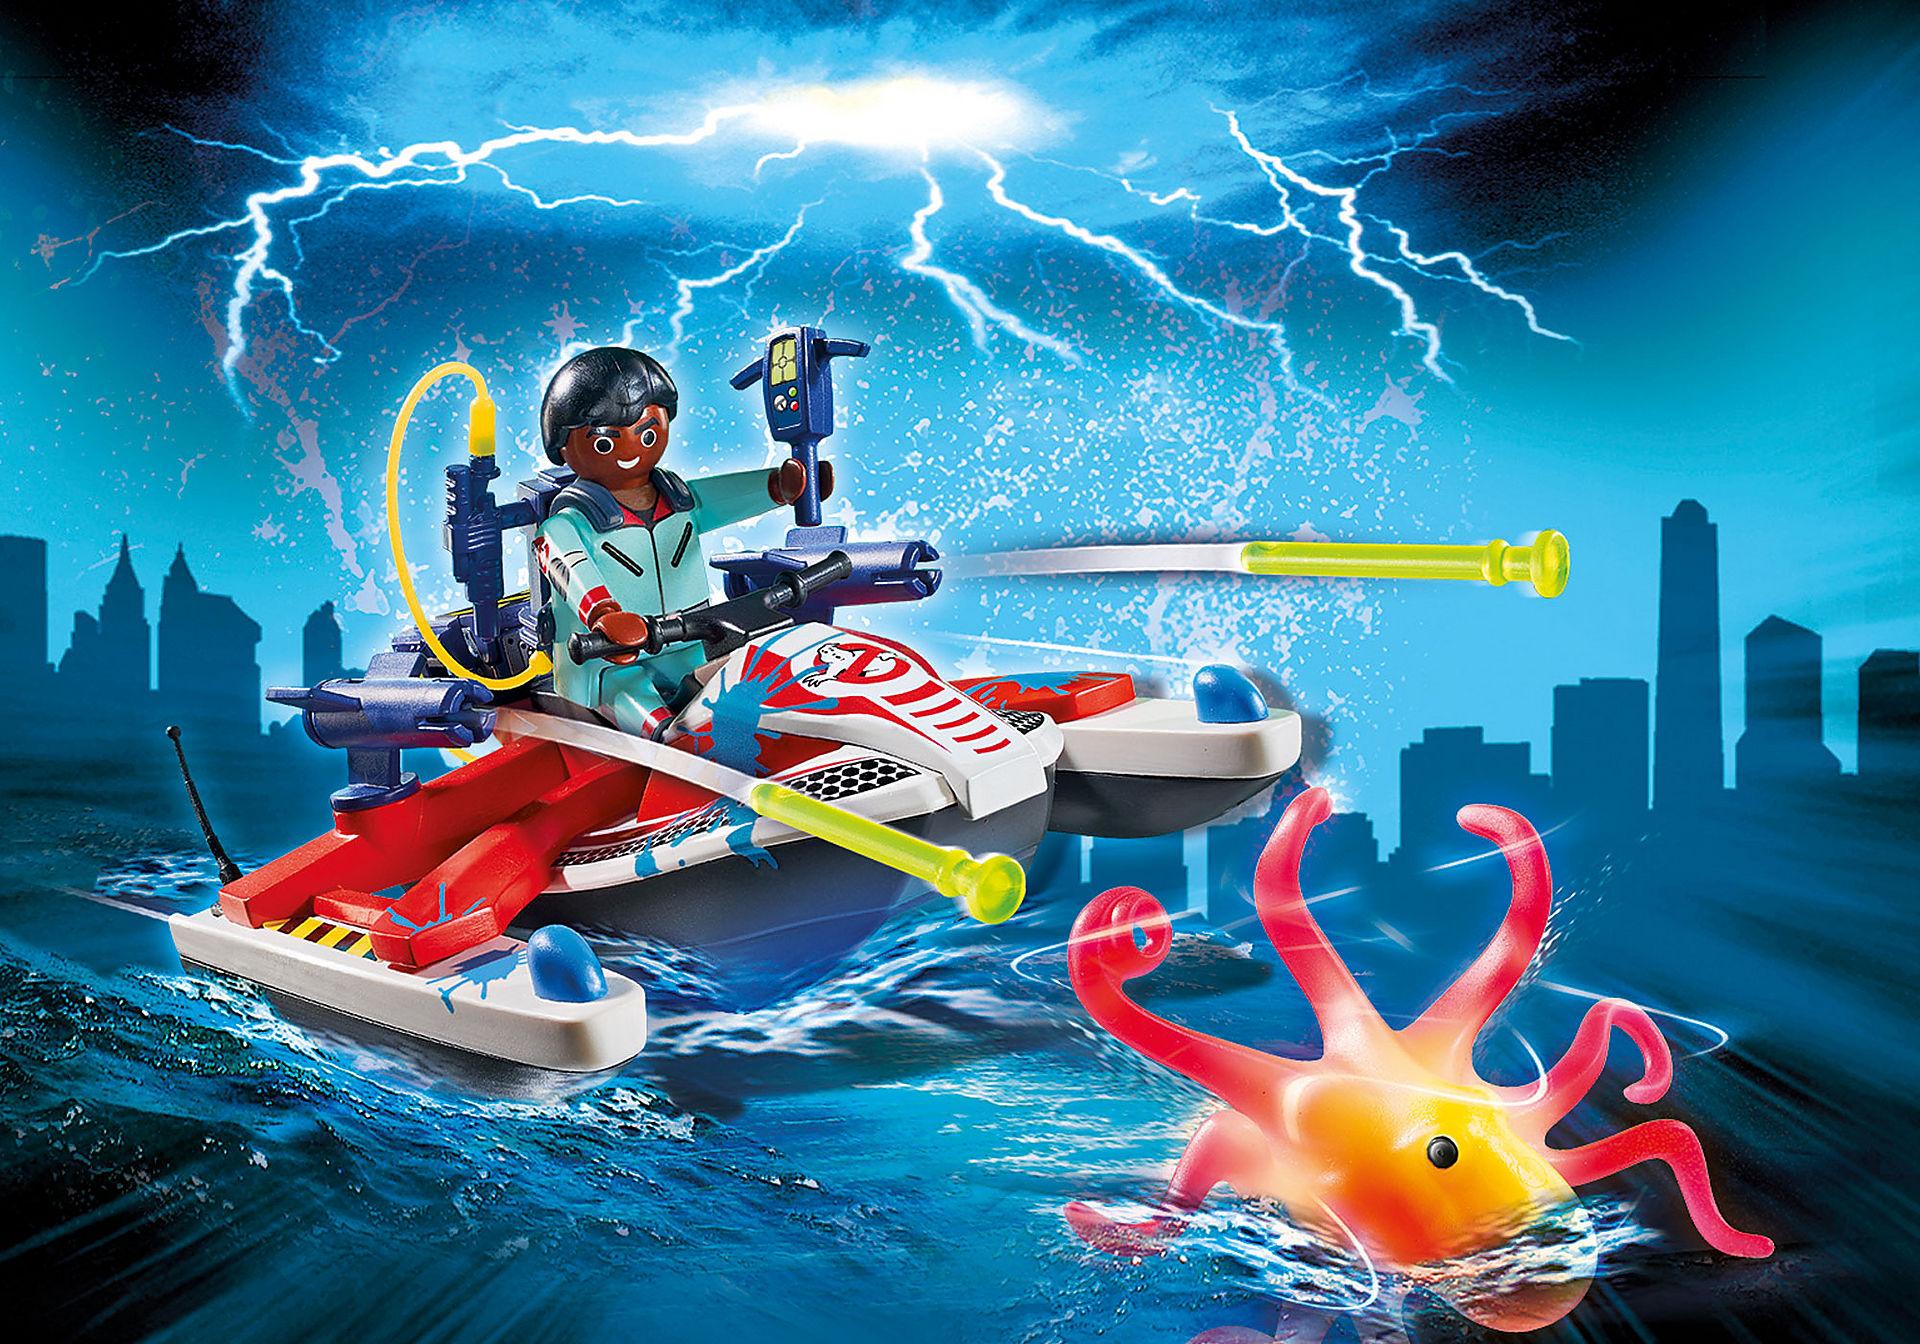 http://media.playmobil.com/i/playmobil/9387_product_detail/Zeddemore with Aqua Scooter